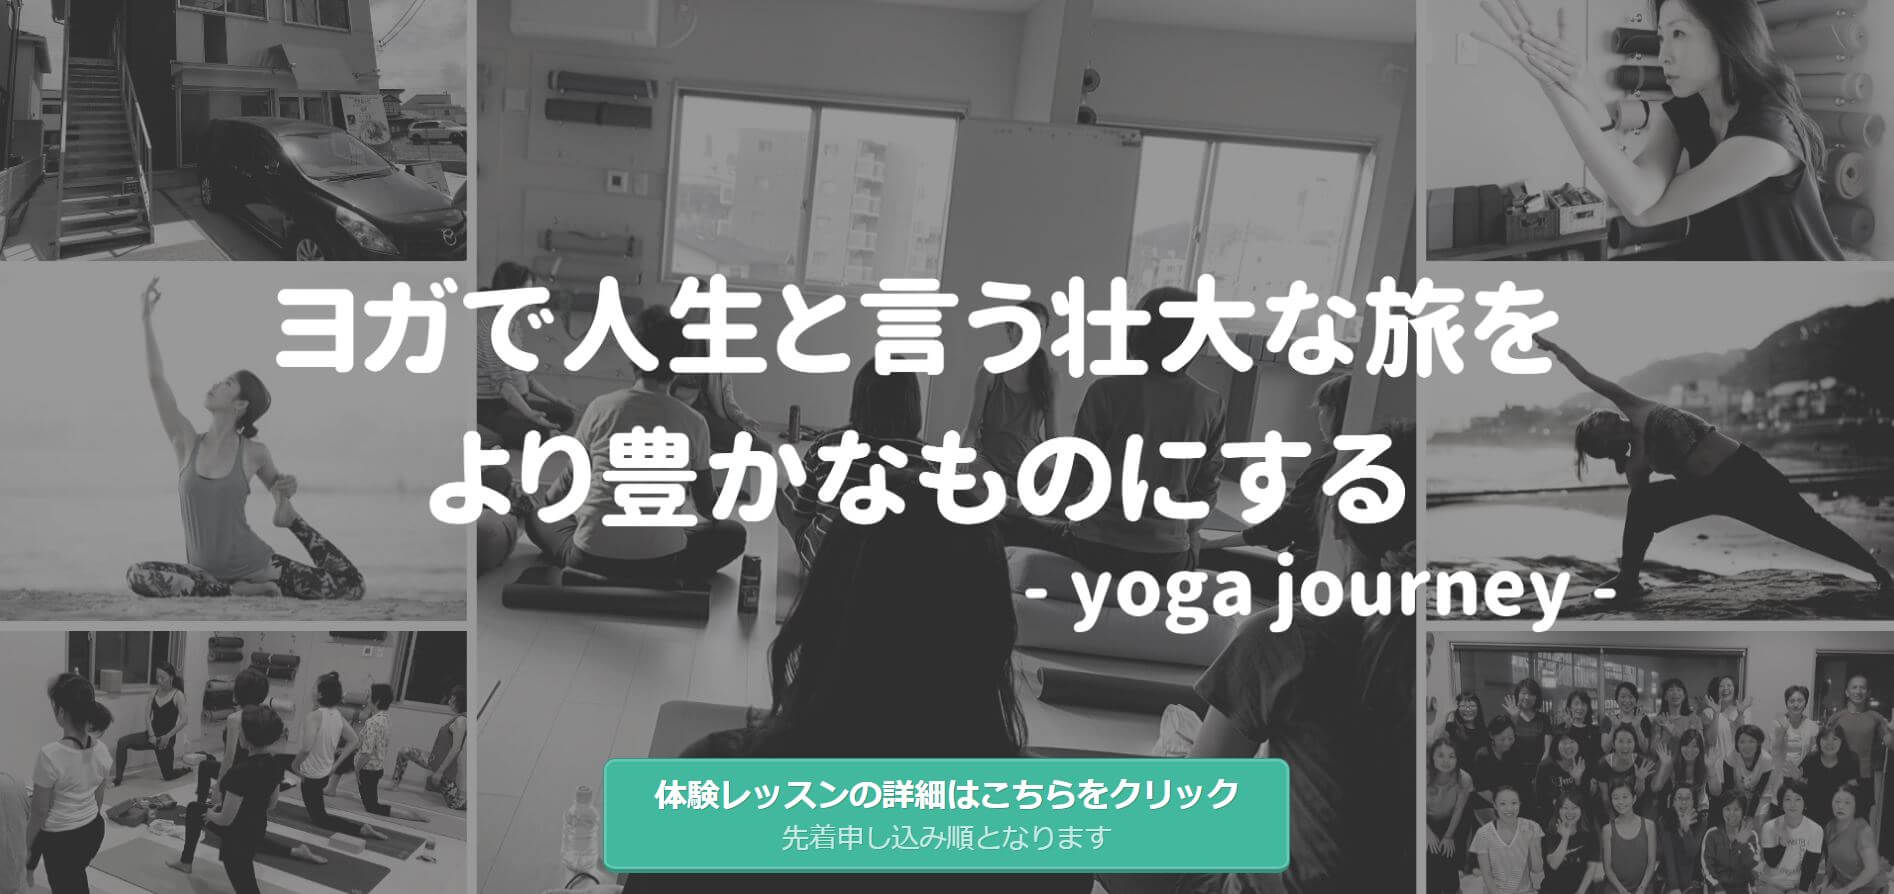 yoga journey(ヨガジャーニー)平塚